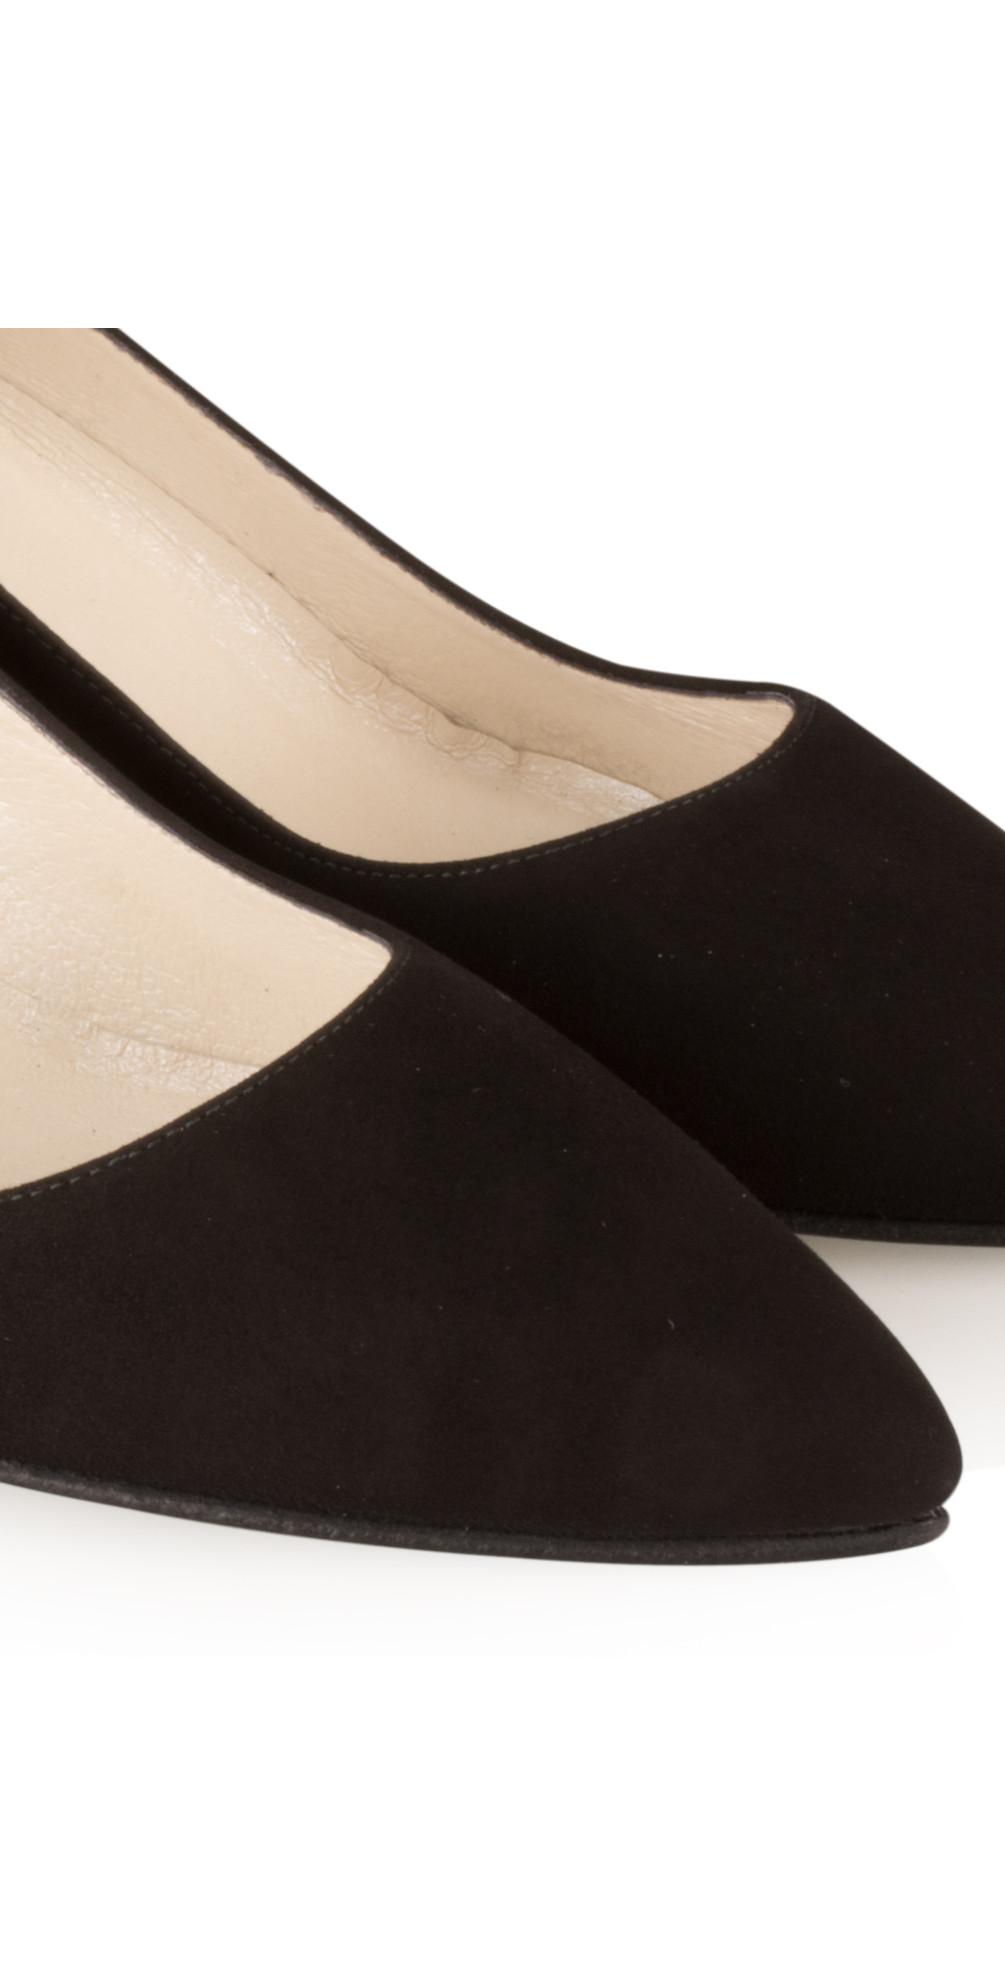 Isa KH Suede Shoe main image